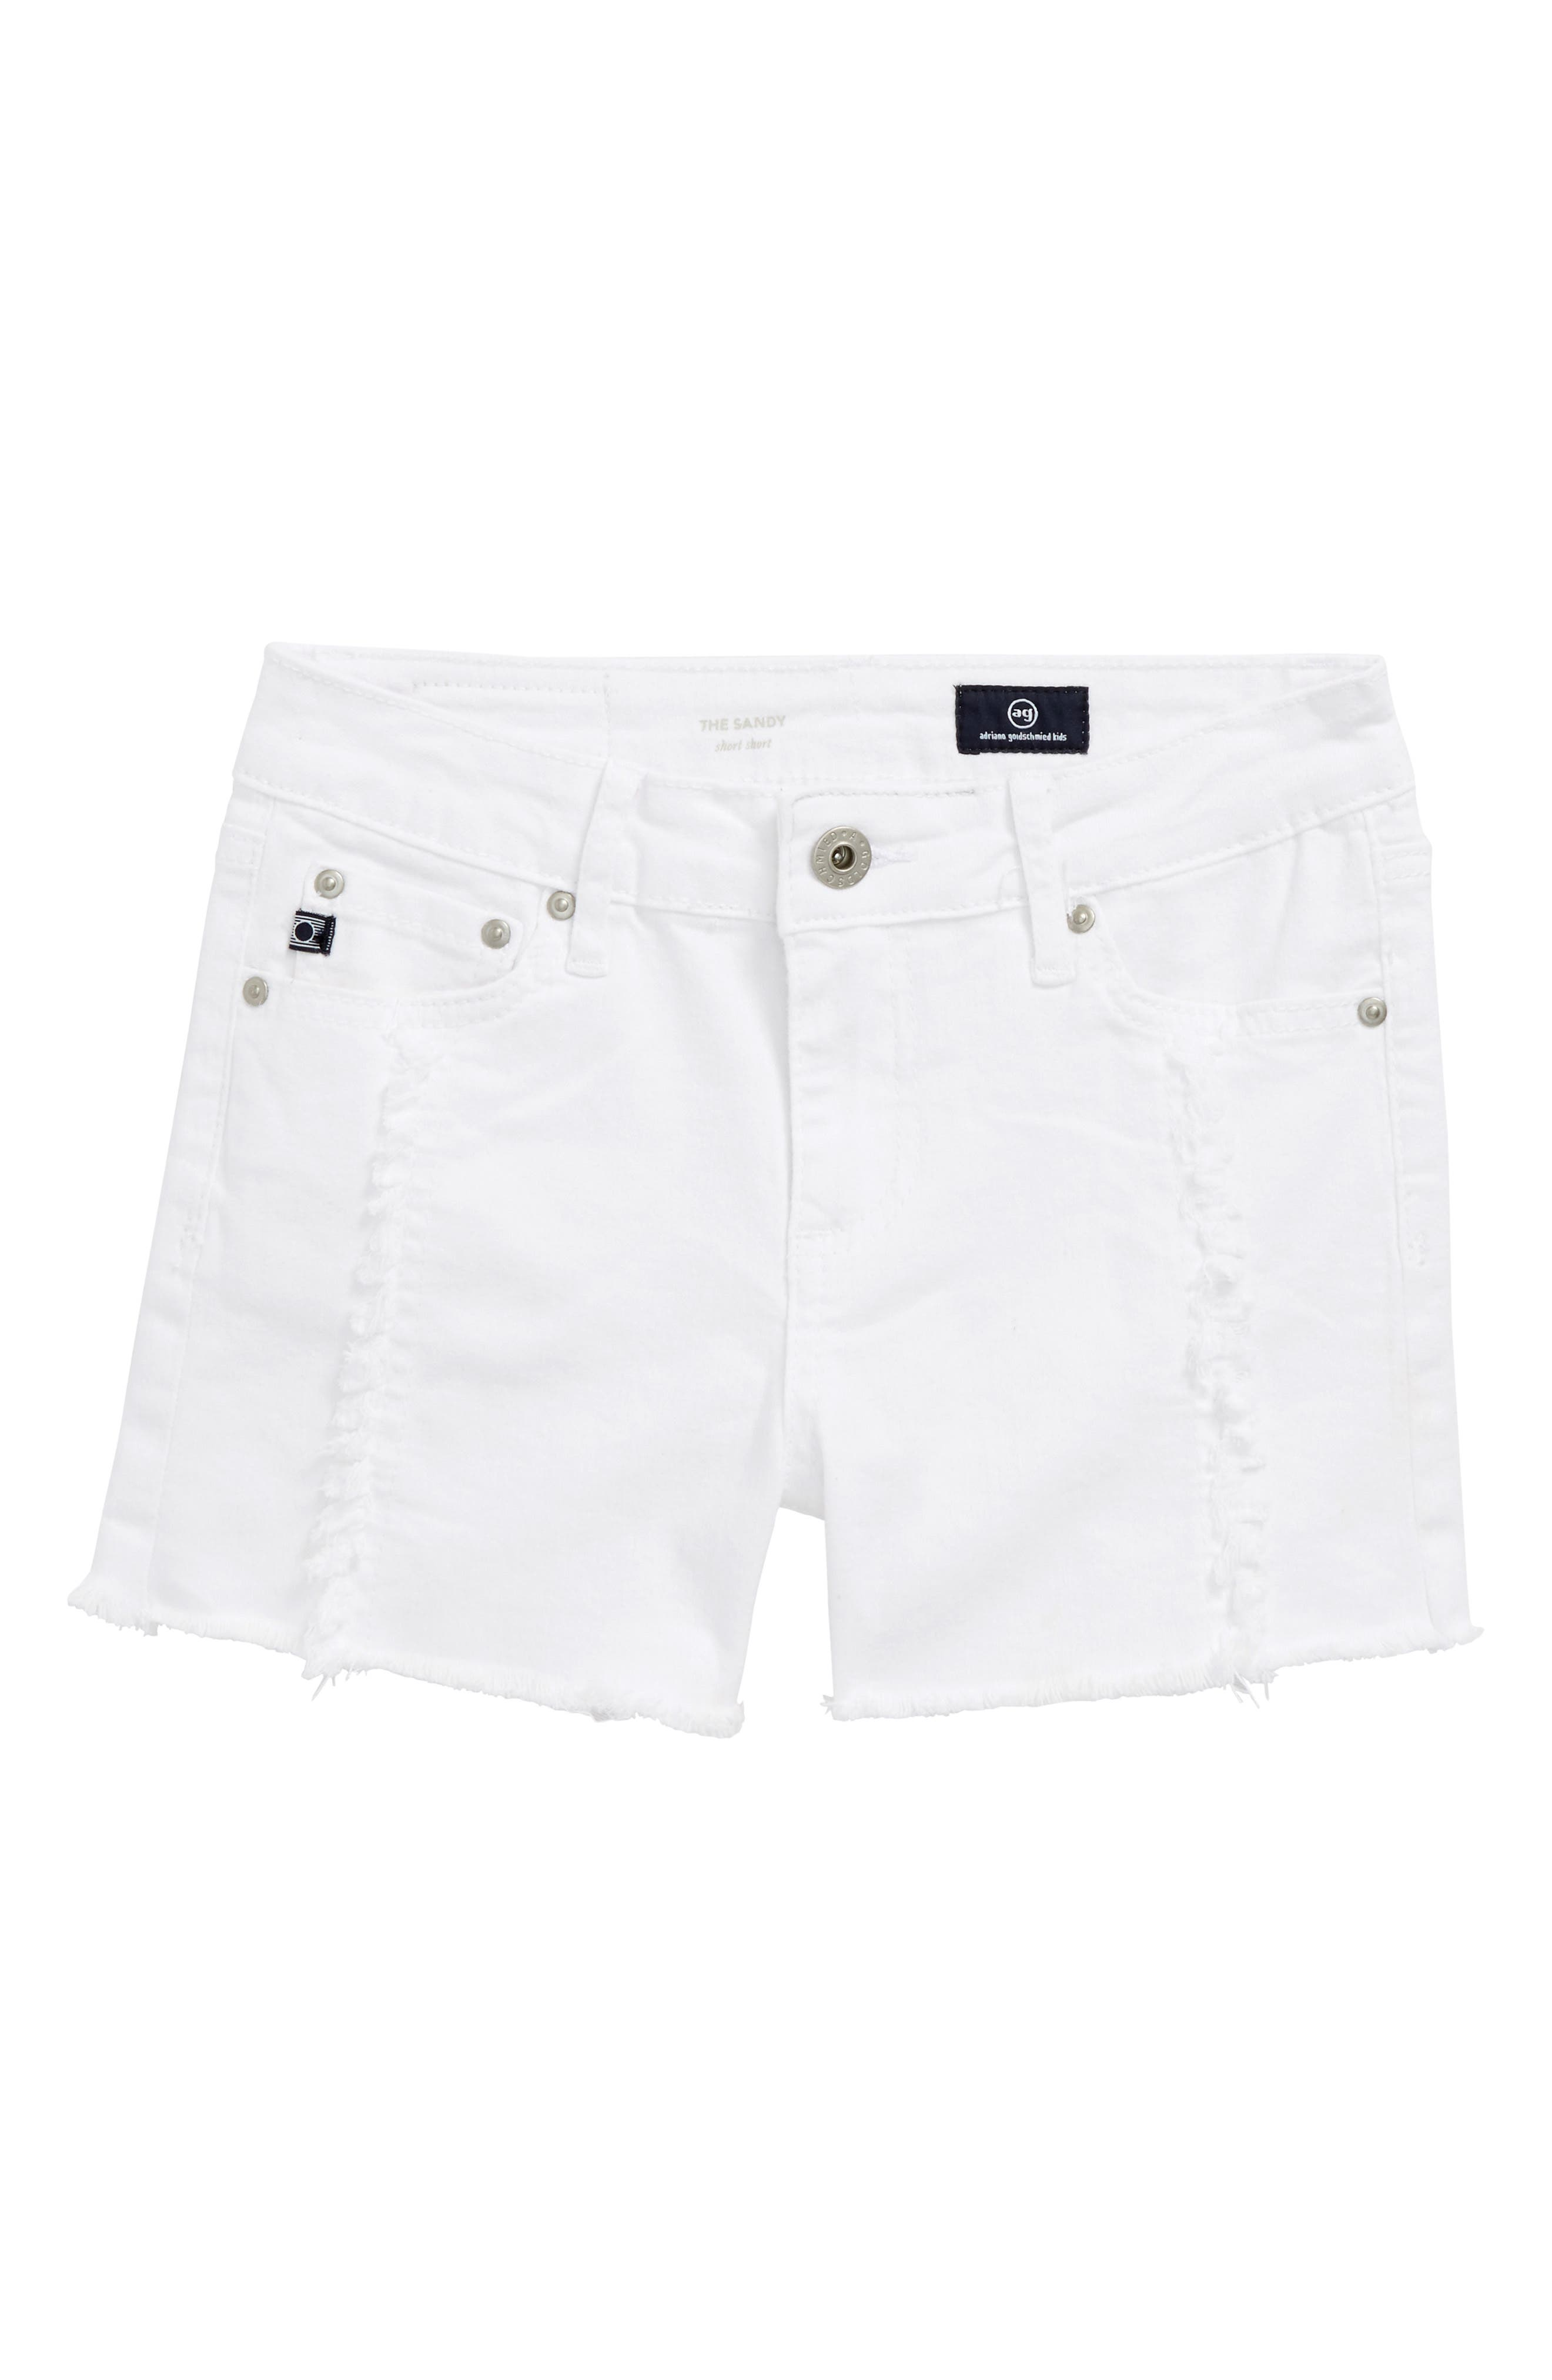 AG The Sandy Shorts,                             Main thumbnail 1, color,                             White